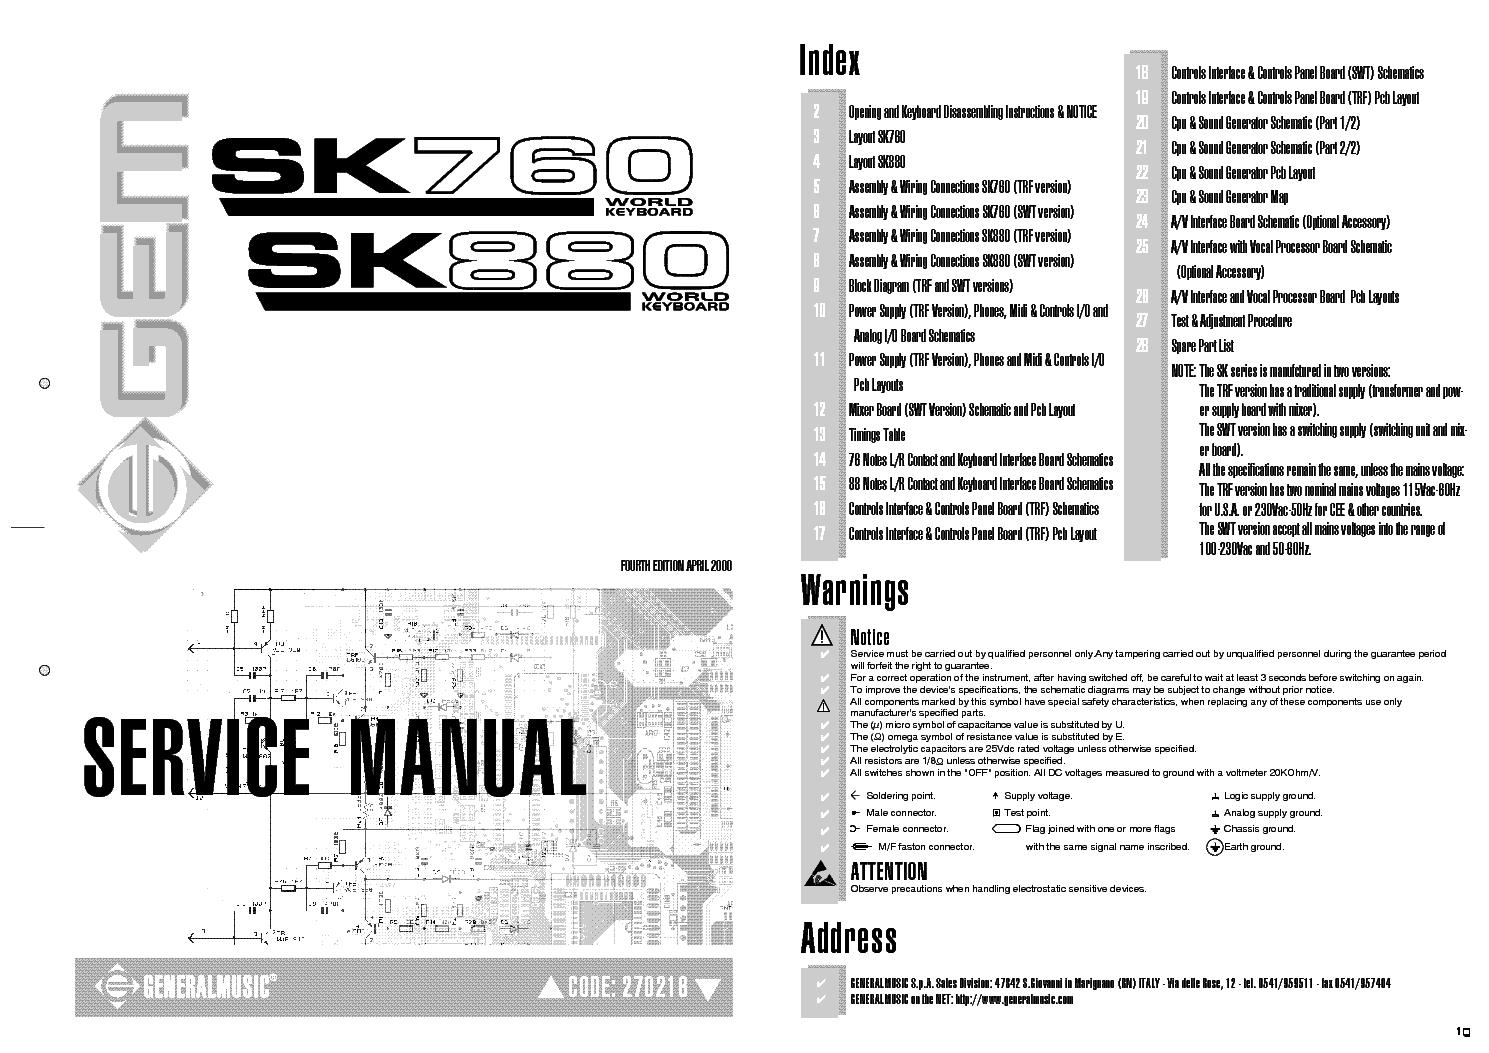 generalmusic gem sk760 gem sk880 service manual download schematics rh elektrotanya com gm service manual torrent gm service manual dvd